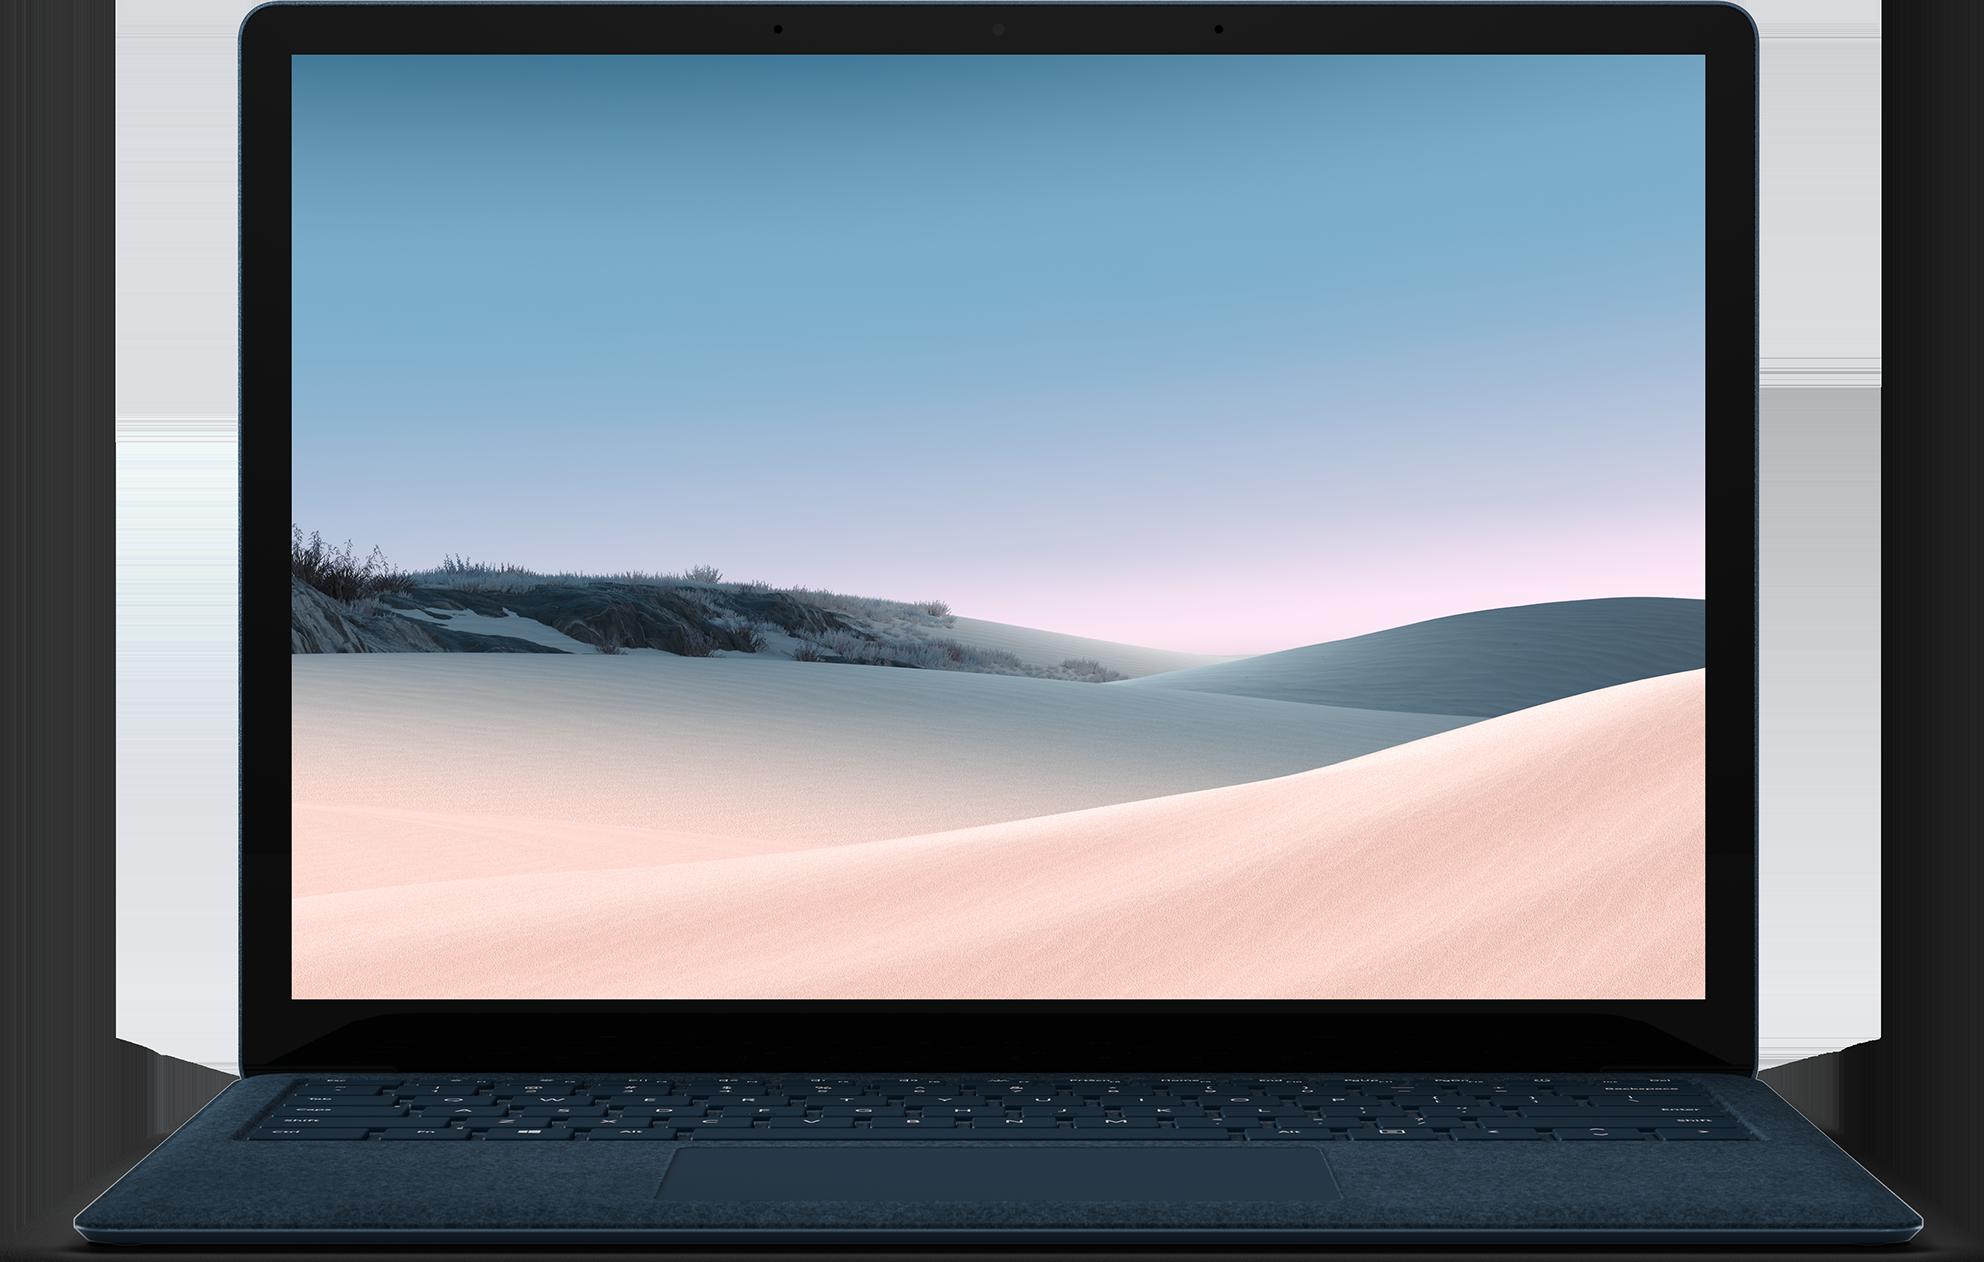 Surface Laptop 3 for Business - 13.5 inch, Cobalt Blue (Alcantara®), Intel Core i5, 8GB, 256GB